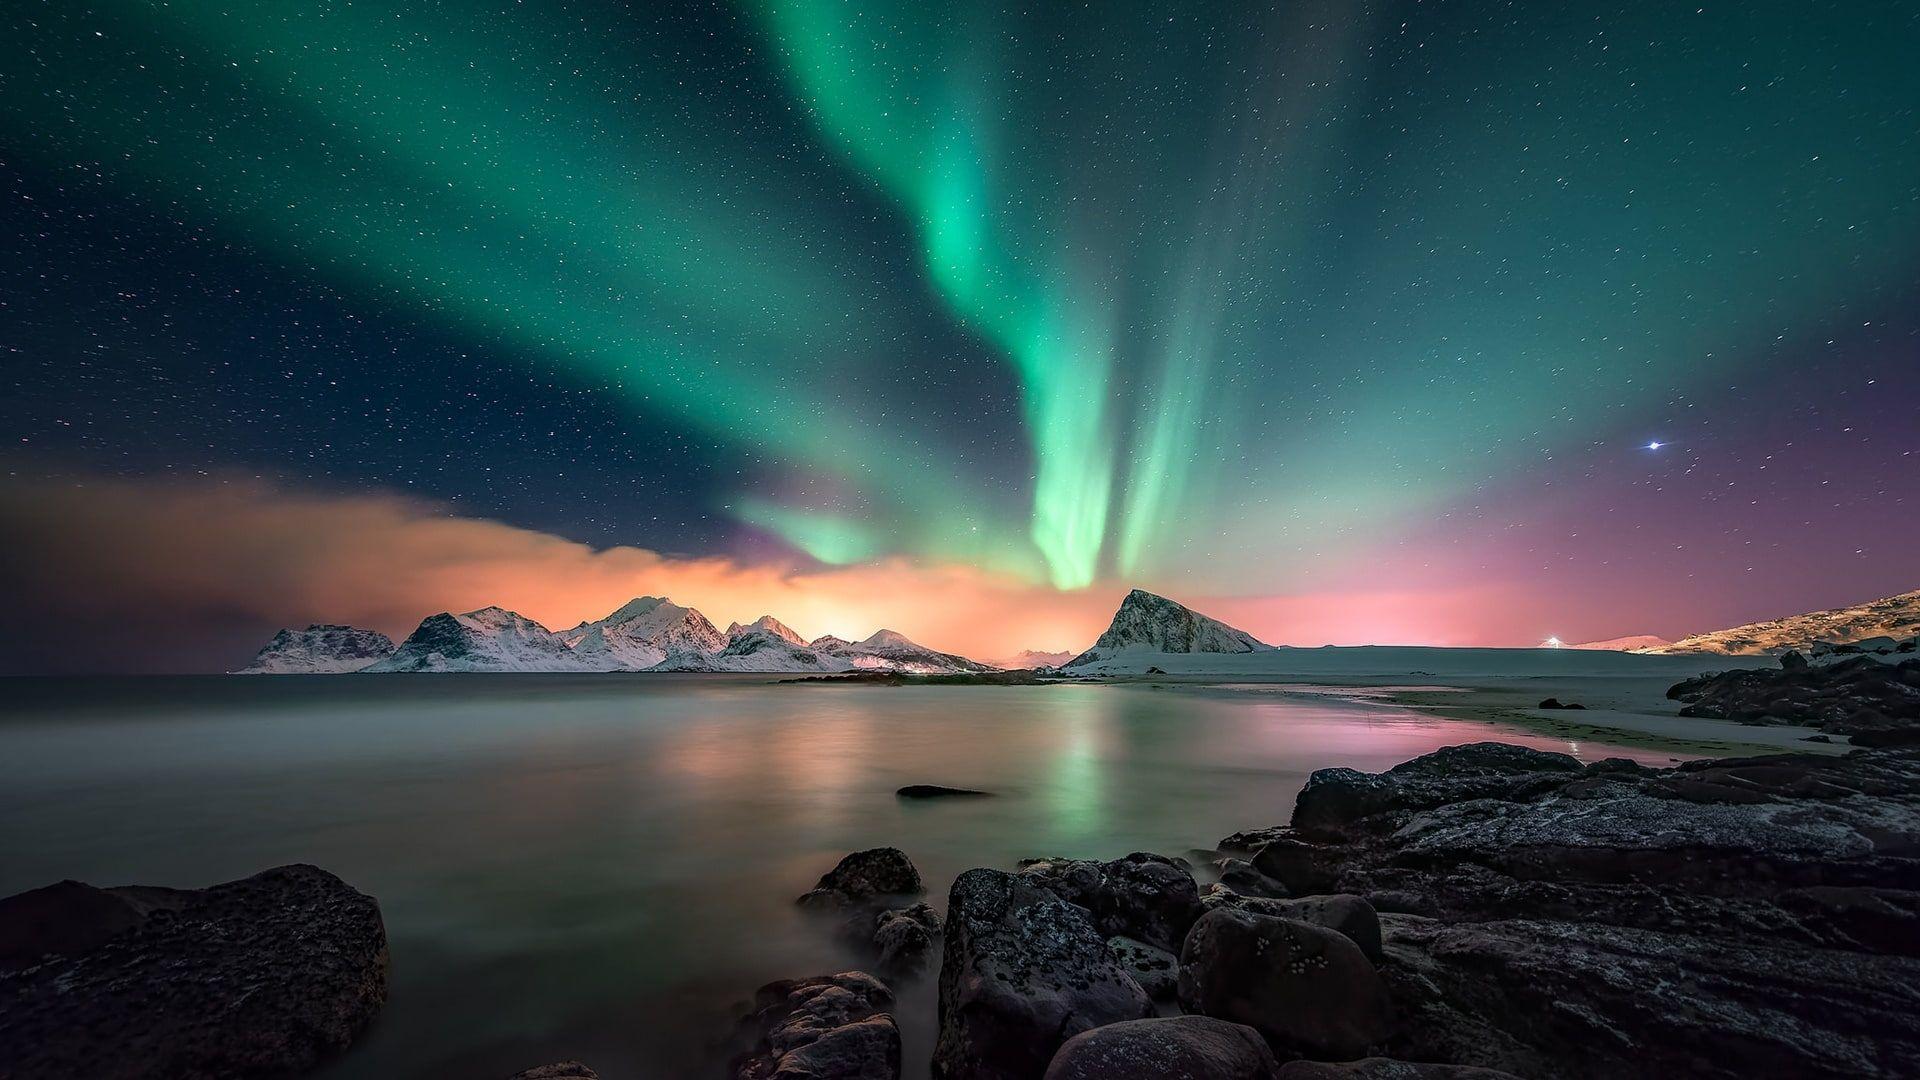 Night Aurora Borealis Lofoten Night Sky Norway Arctic Europe Landscape Polar Lights Northern Lights In 2020 Northern Lights Wallpaper Aurora Boreal Night Skies